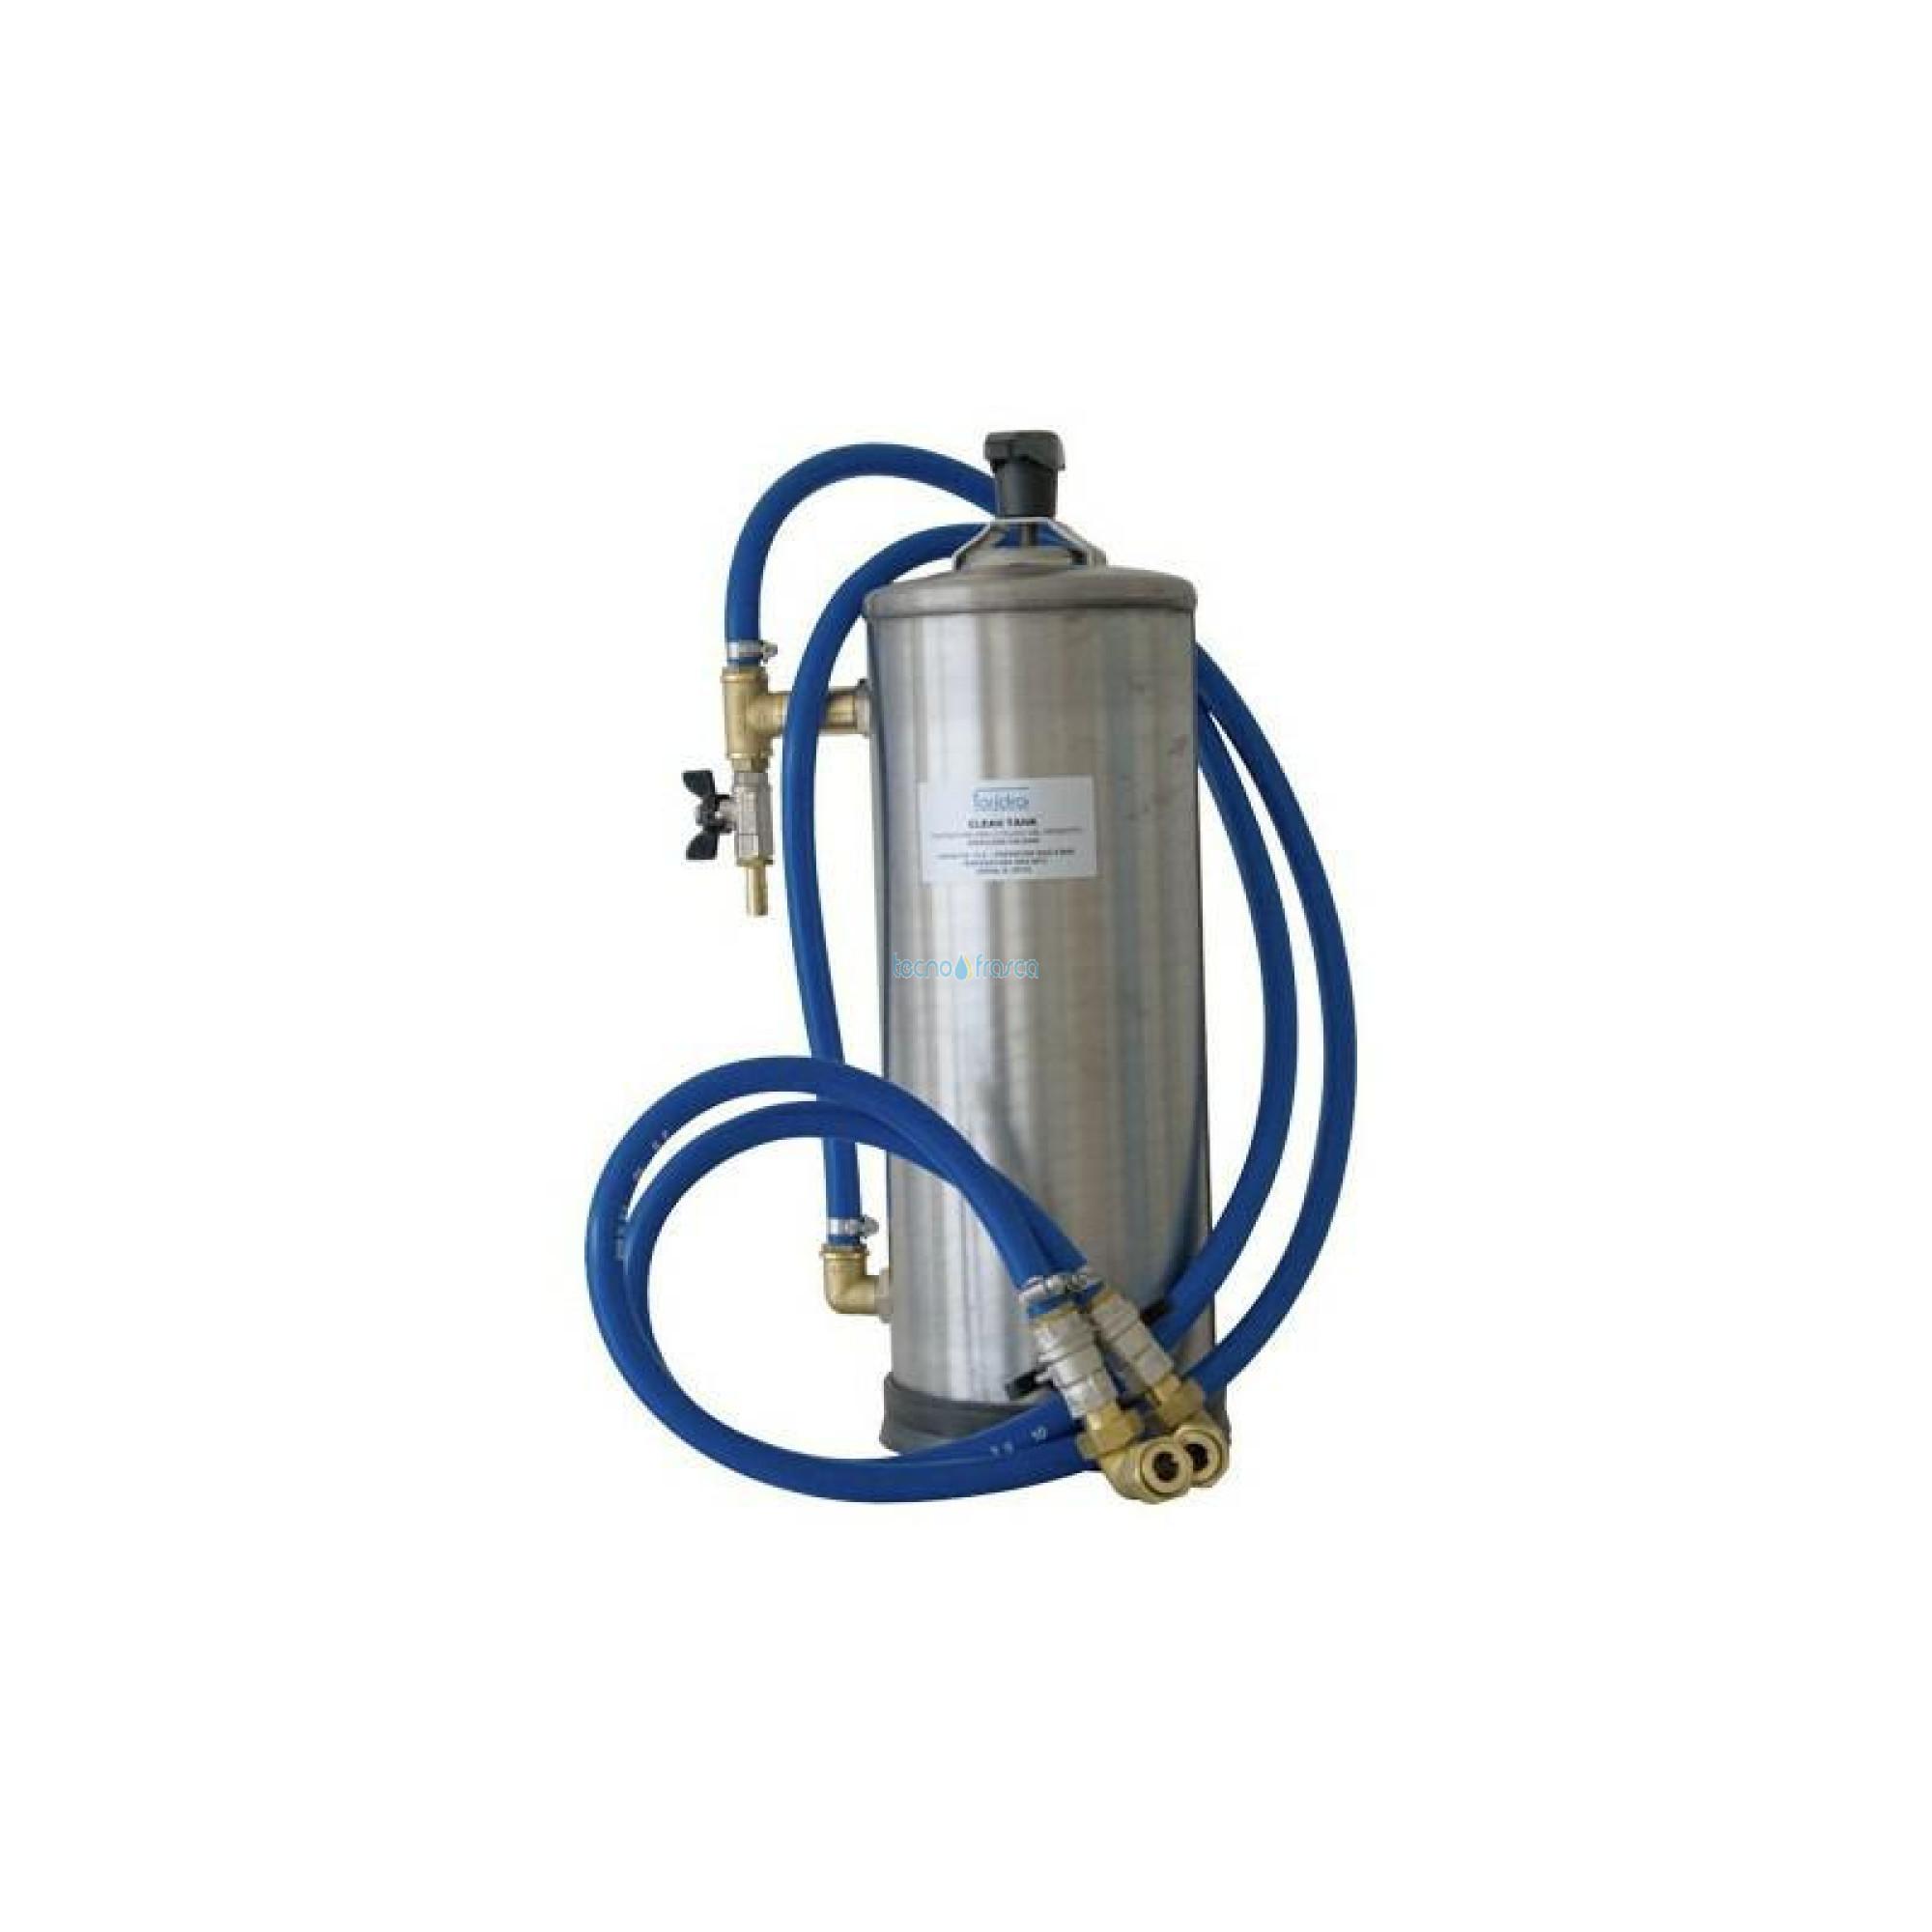 Cleantank foridra pompa pulizia caldaia